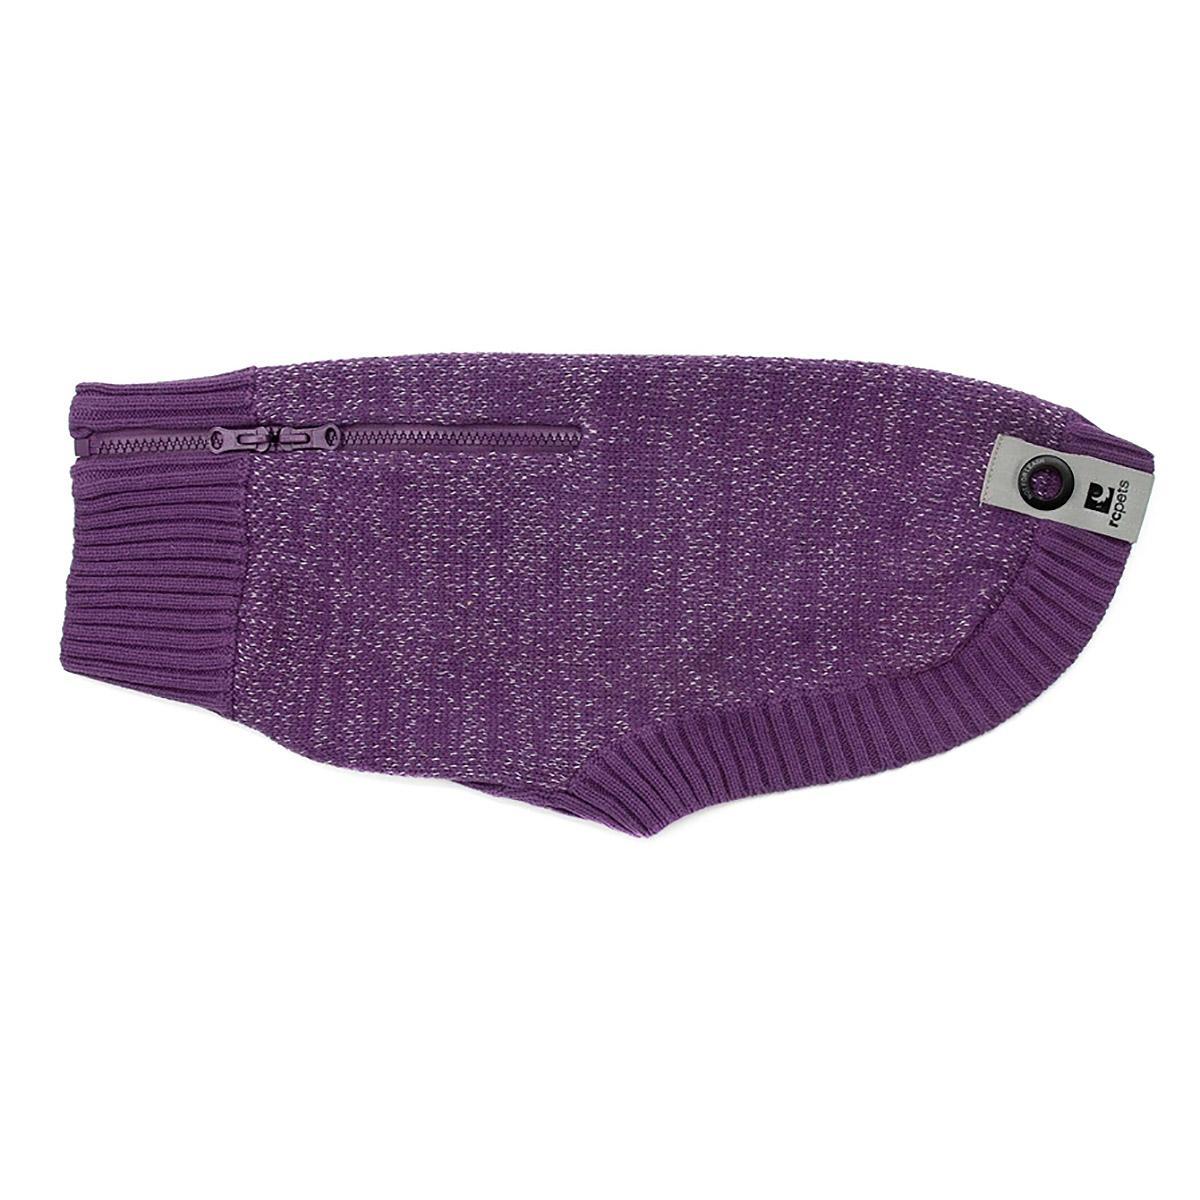 Polaris Reflective Dog Sweater - Plum Purple